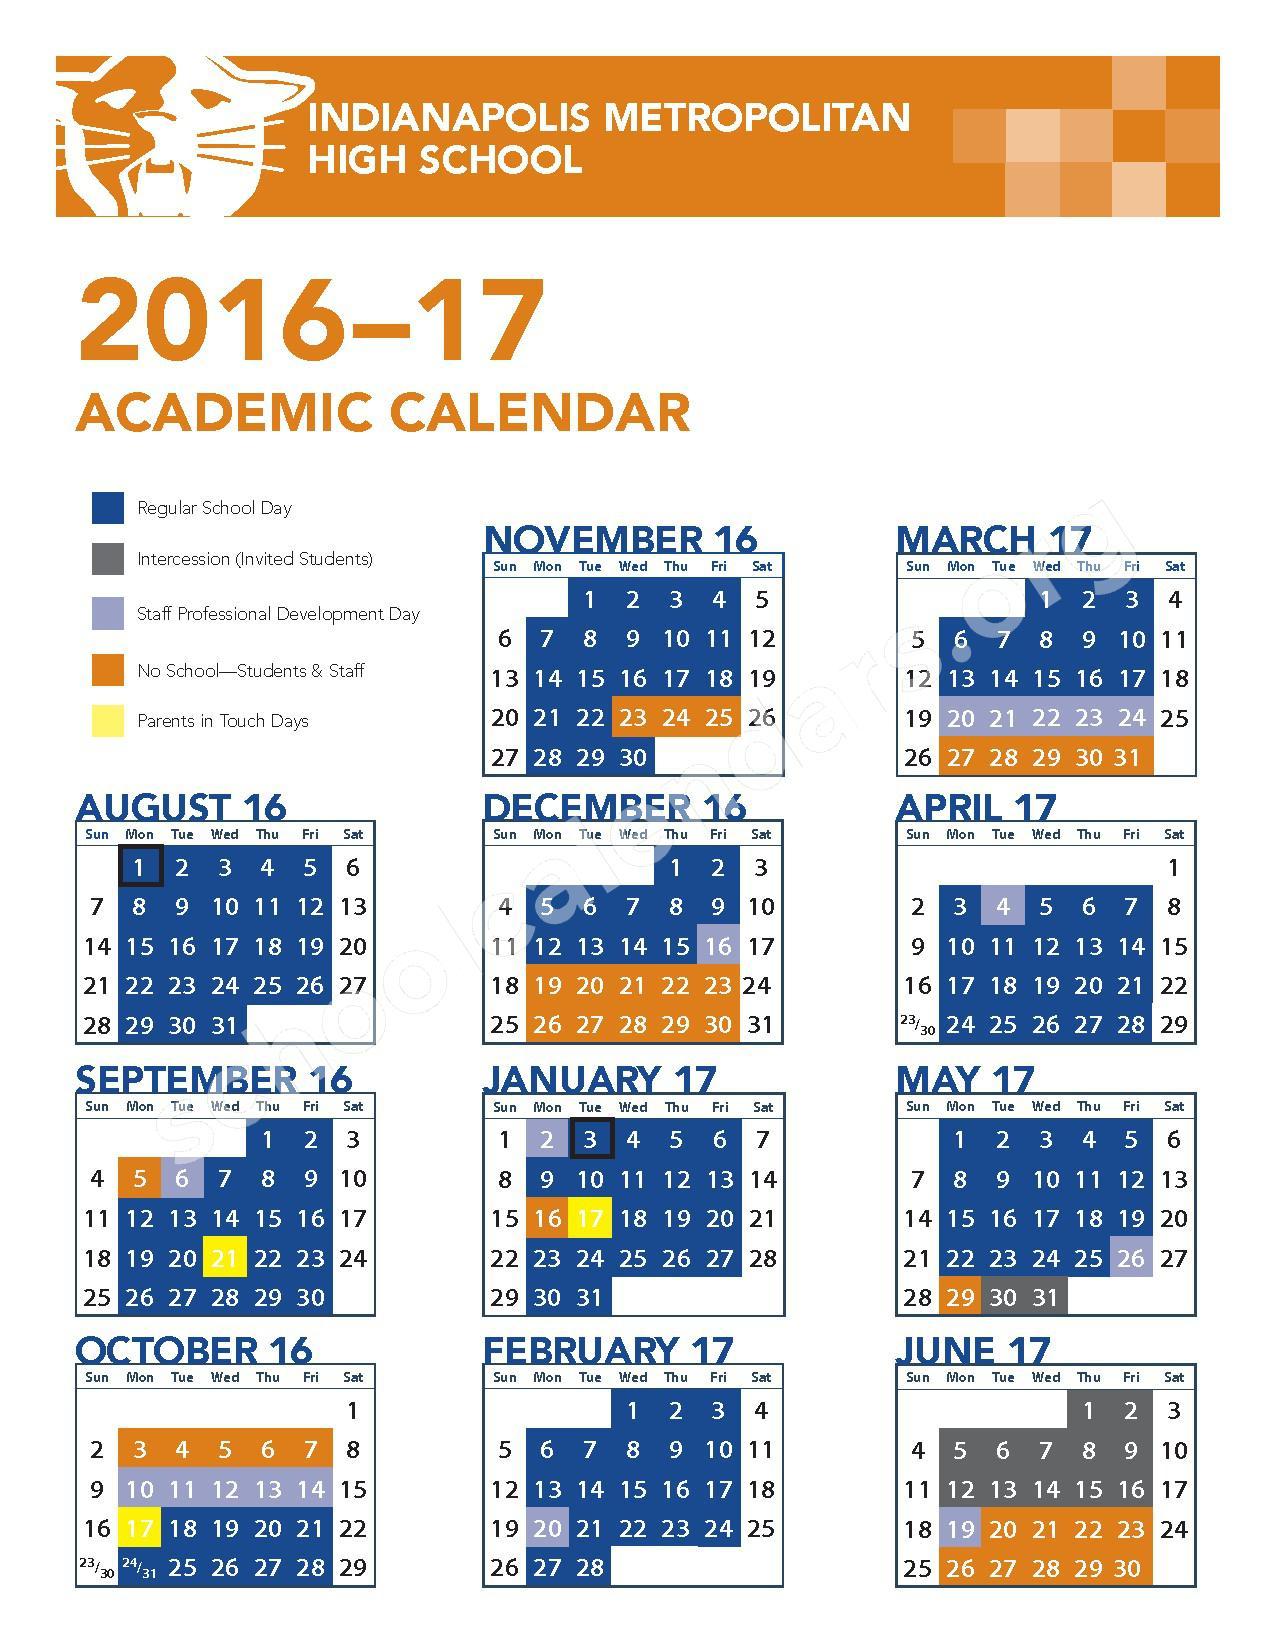 2016 - 2017 Academic Calendar – Indianapolis Metropolitan High School – page 1